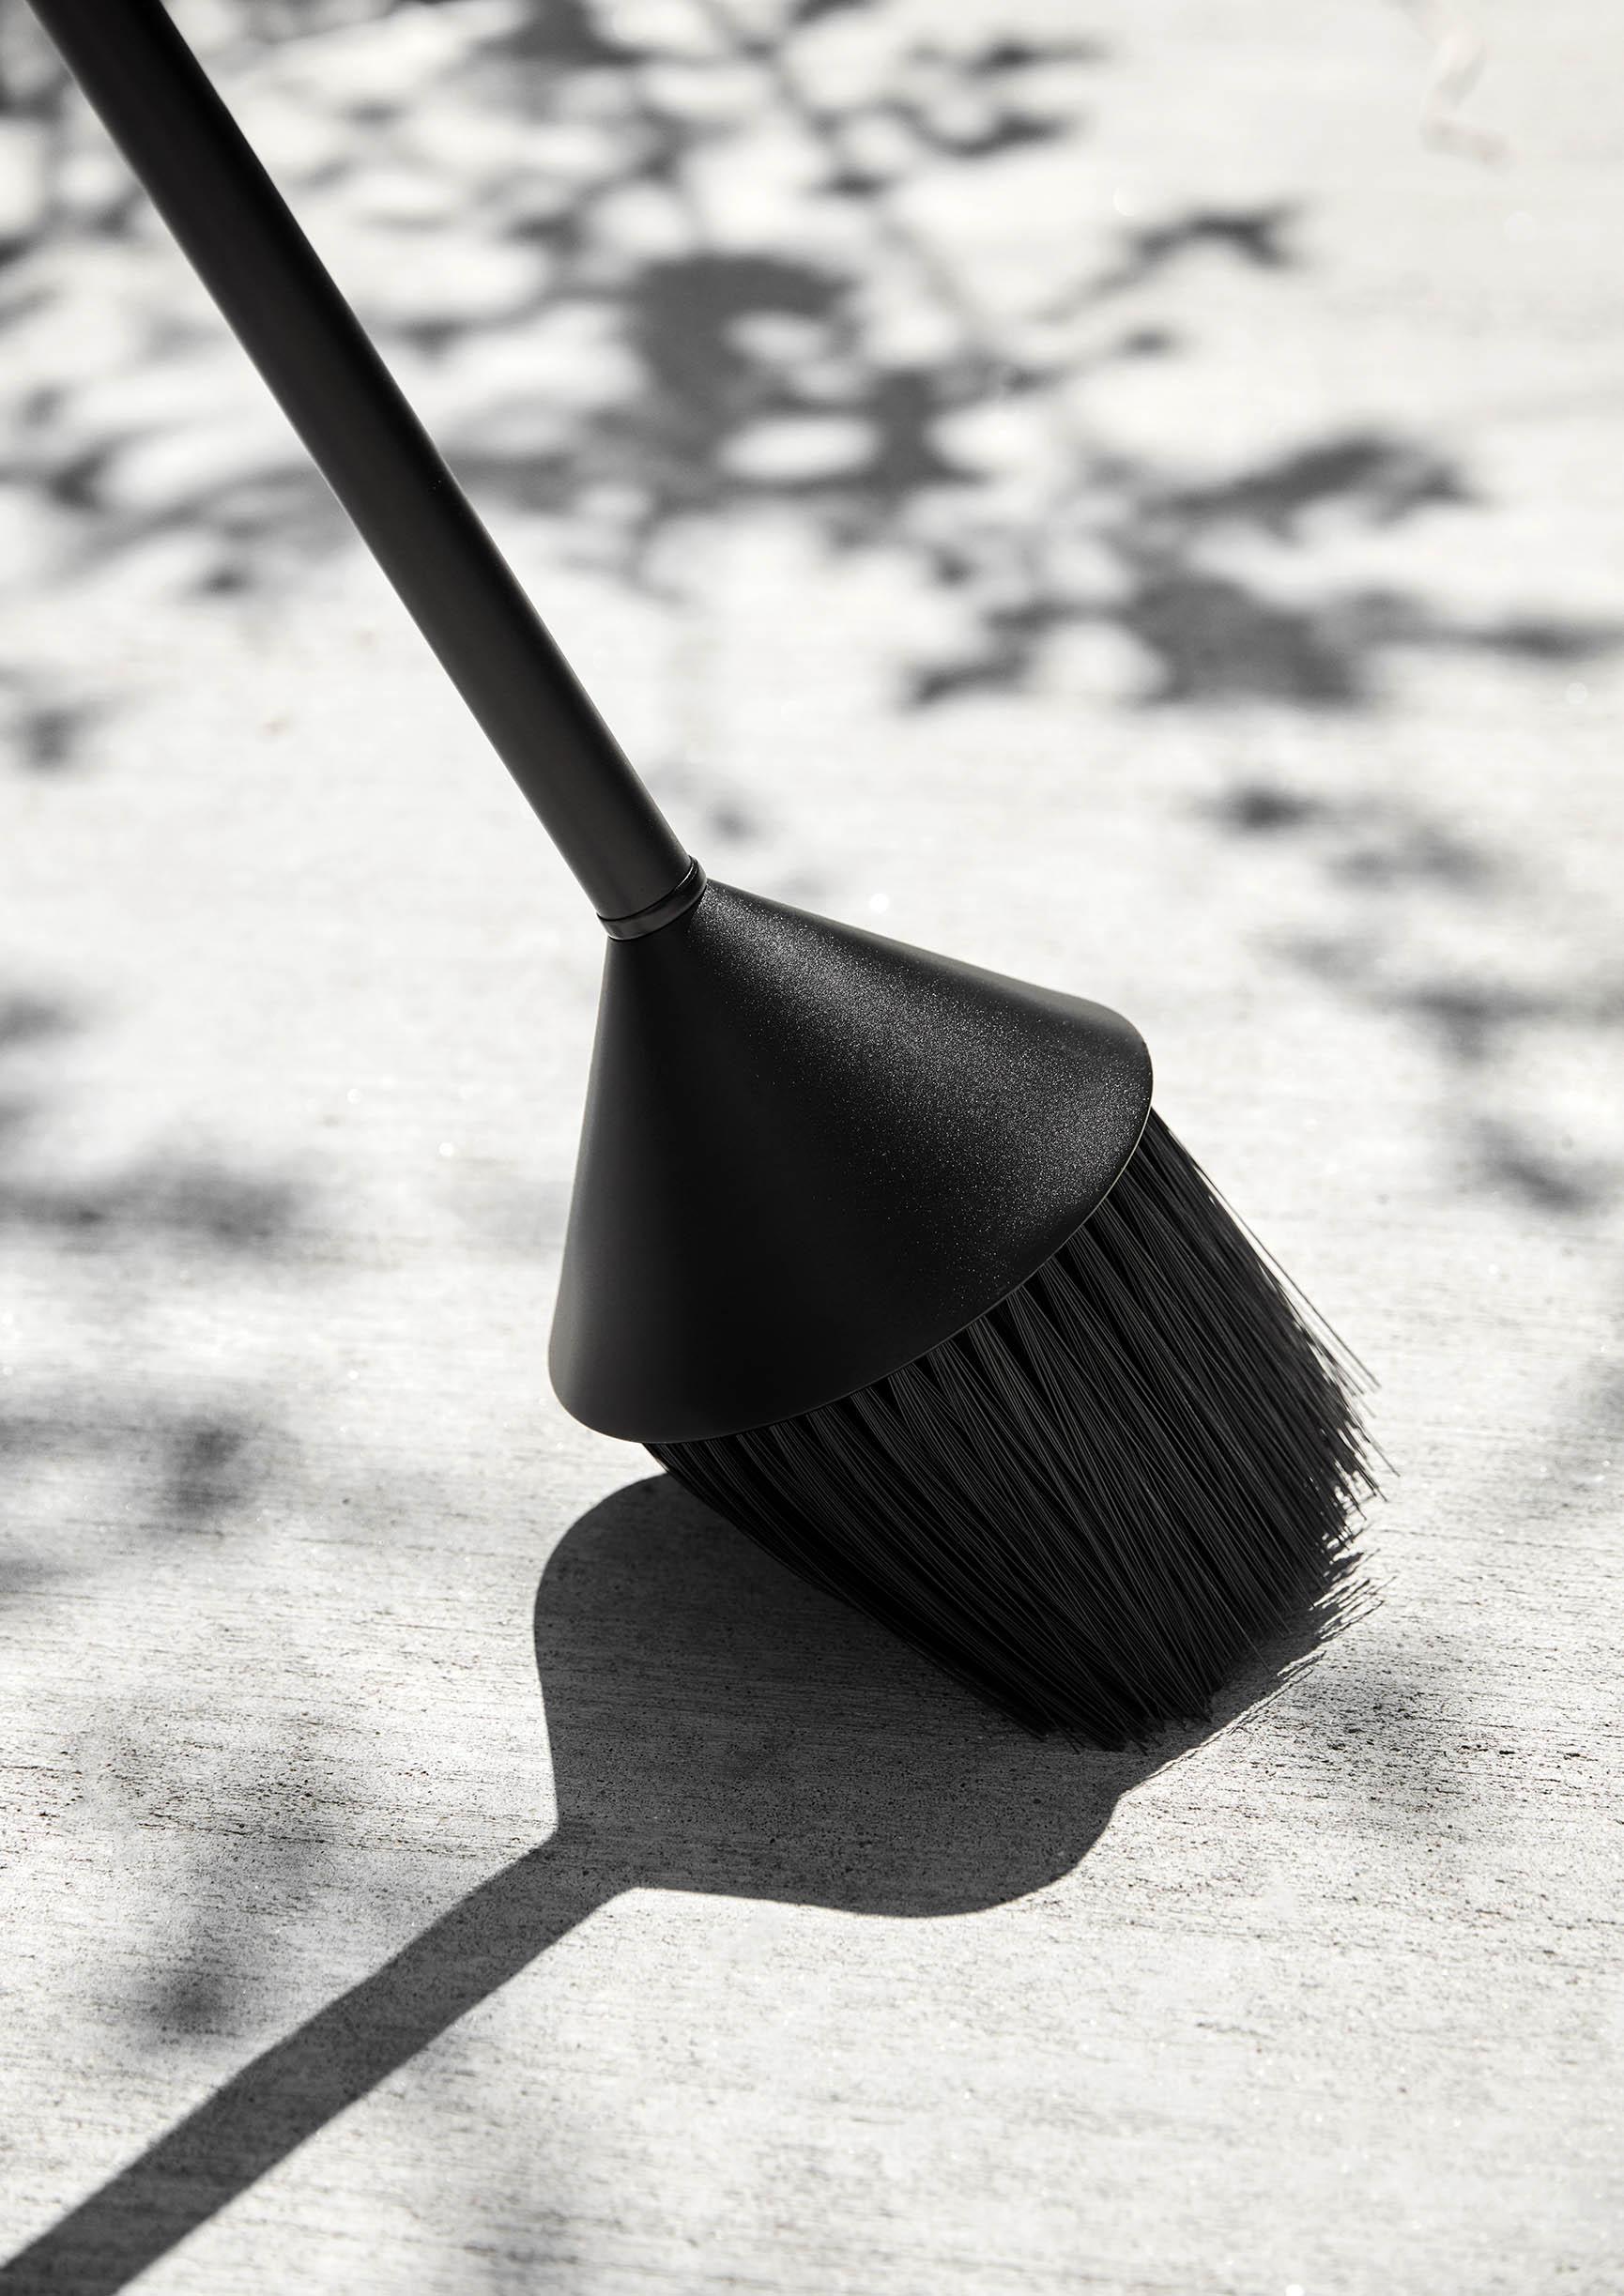 Mim_black_sweep_outside-Northern-Photo_Chris_Tonnesen_Low-res